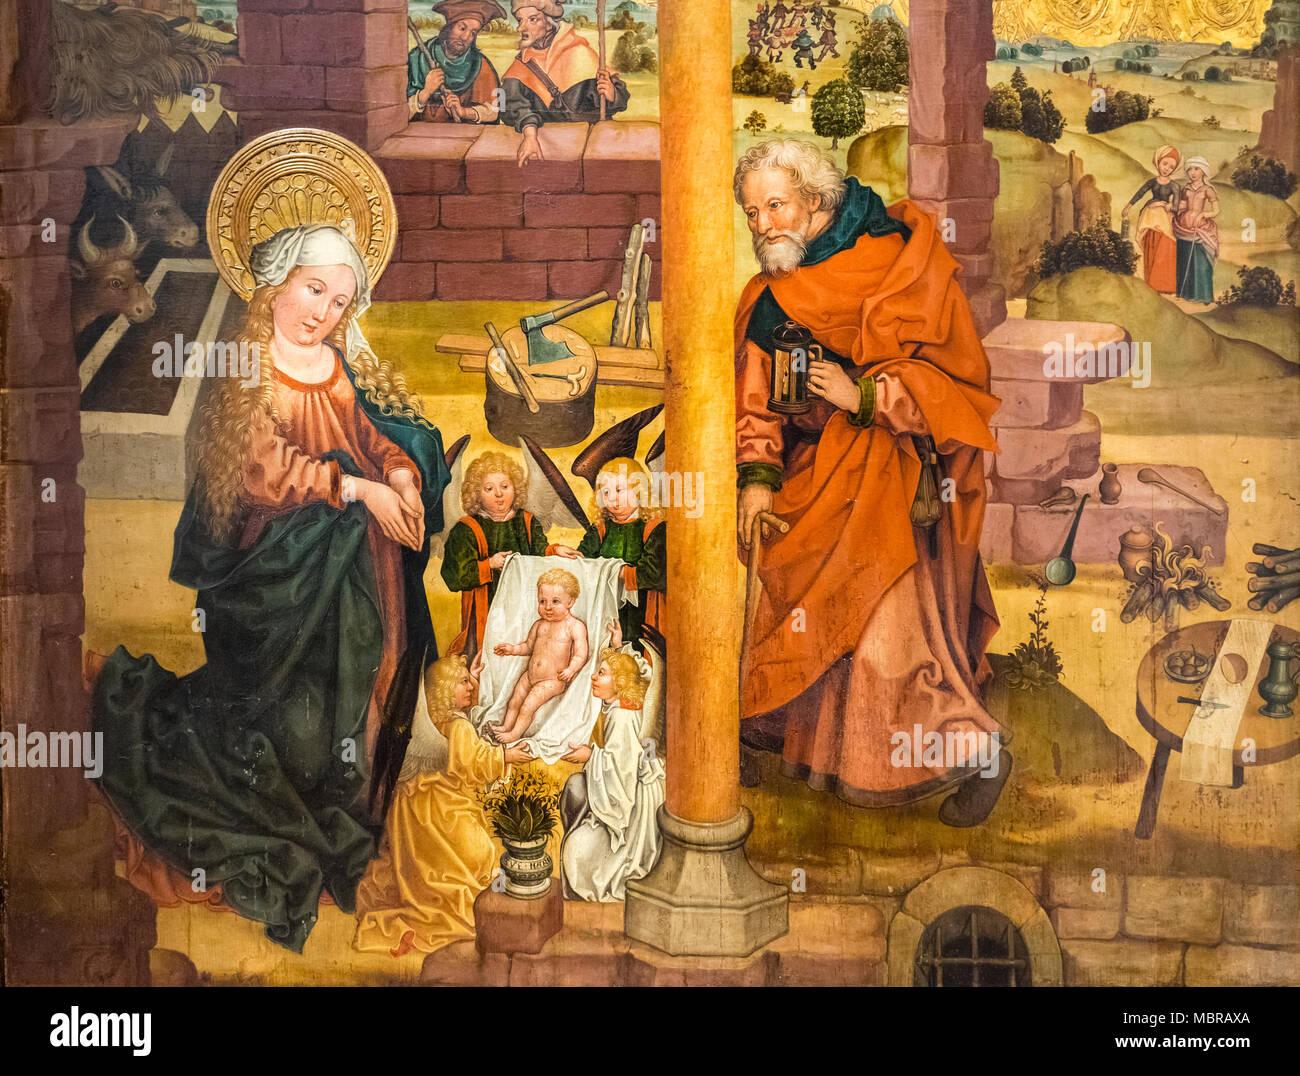 Malerei Weihnachten Szene, Geburt Christi, C. 1480, Museum ...